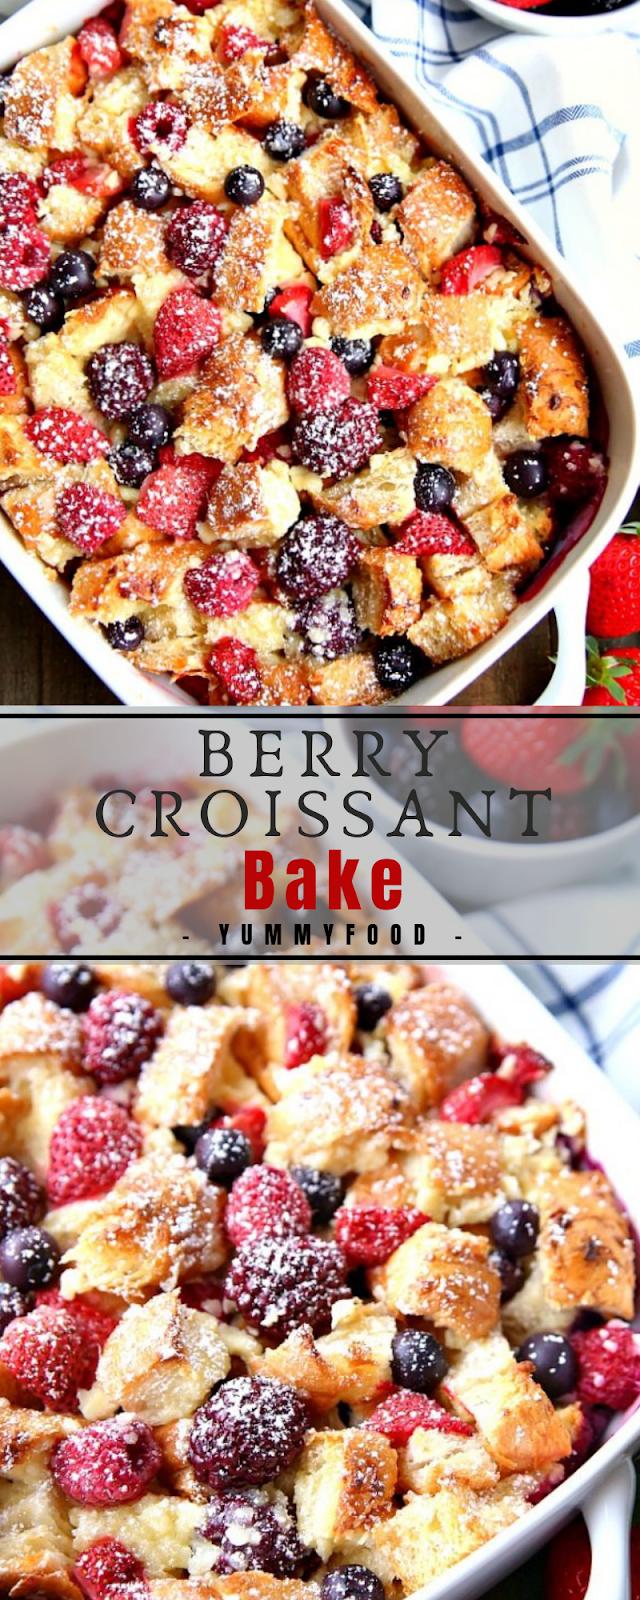 Berry Crоіѕѕаnt Bake